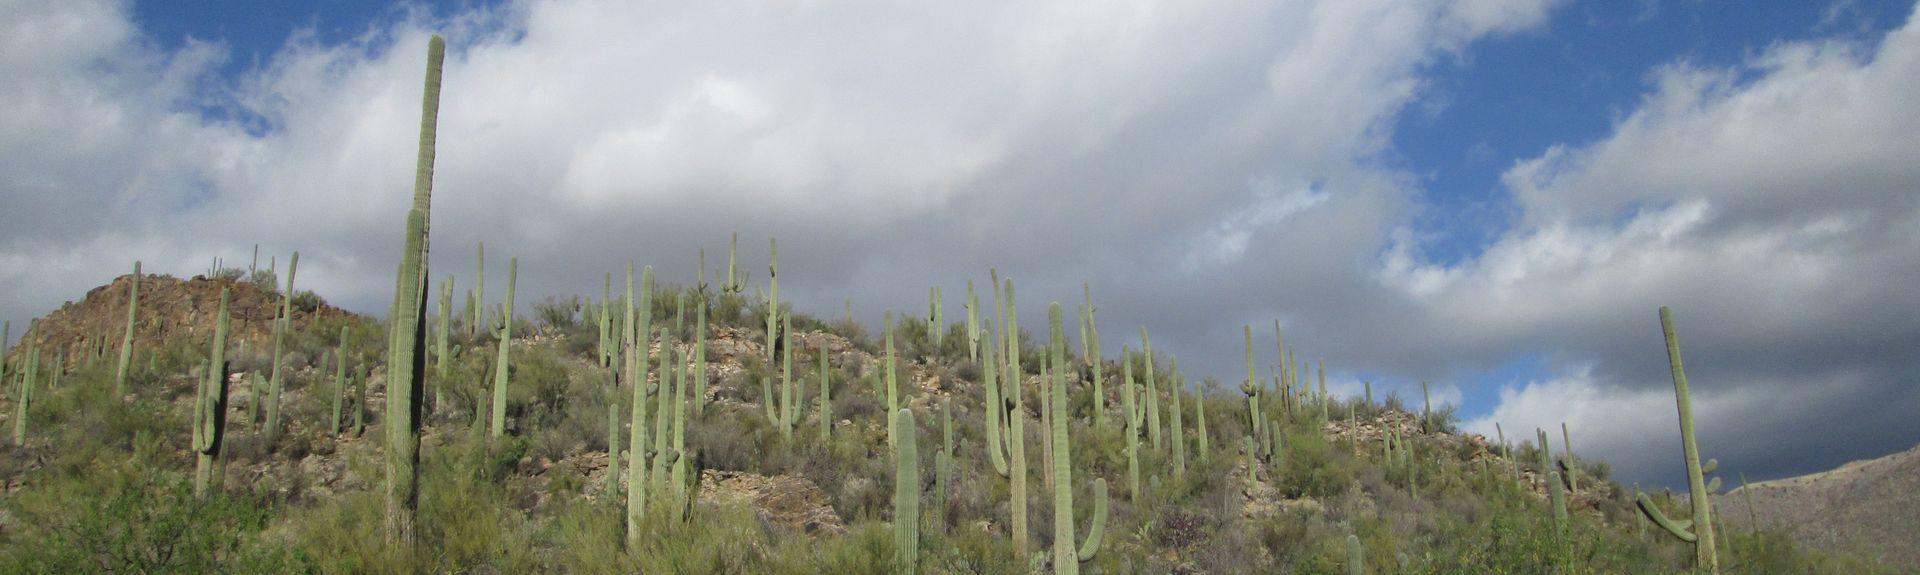 Palo Verde, Tucson, Arizona, Estados Unidos